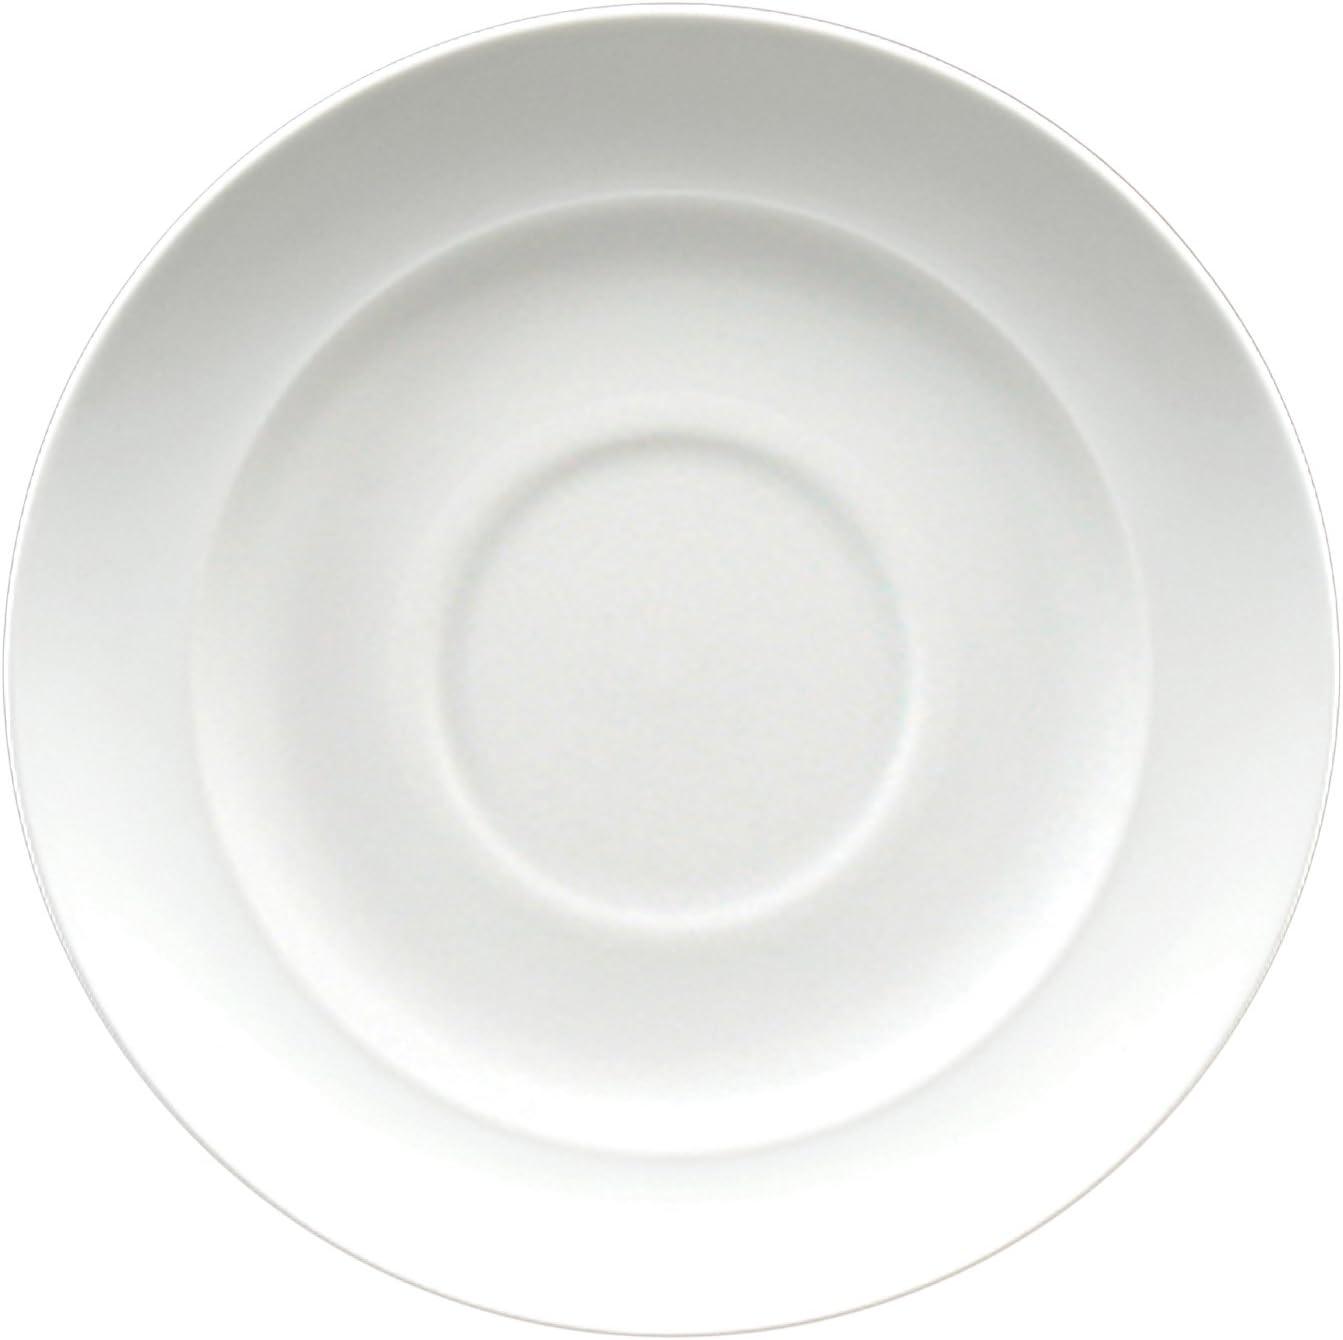 Fortessa Industry No. Ranking TOP7 1 Fortaluxe SuperWhite Vitrified China Cassia Dinnerware